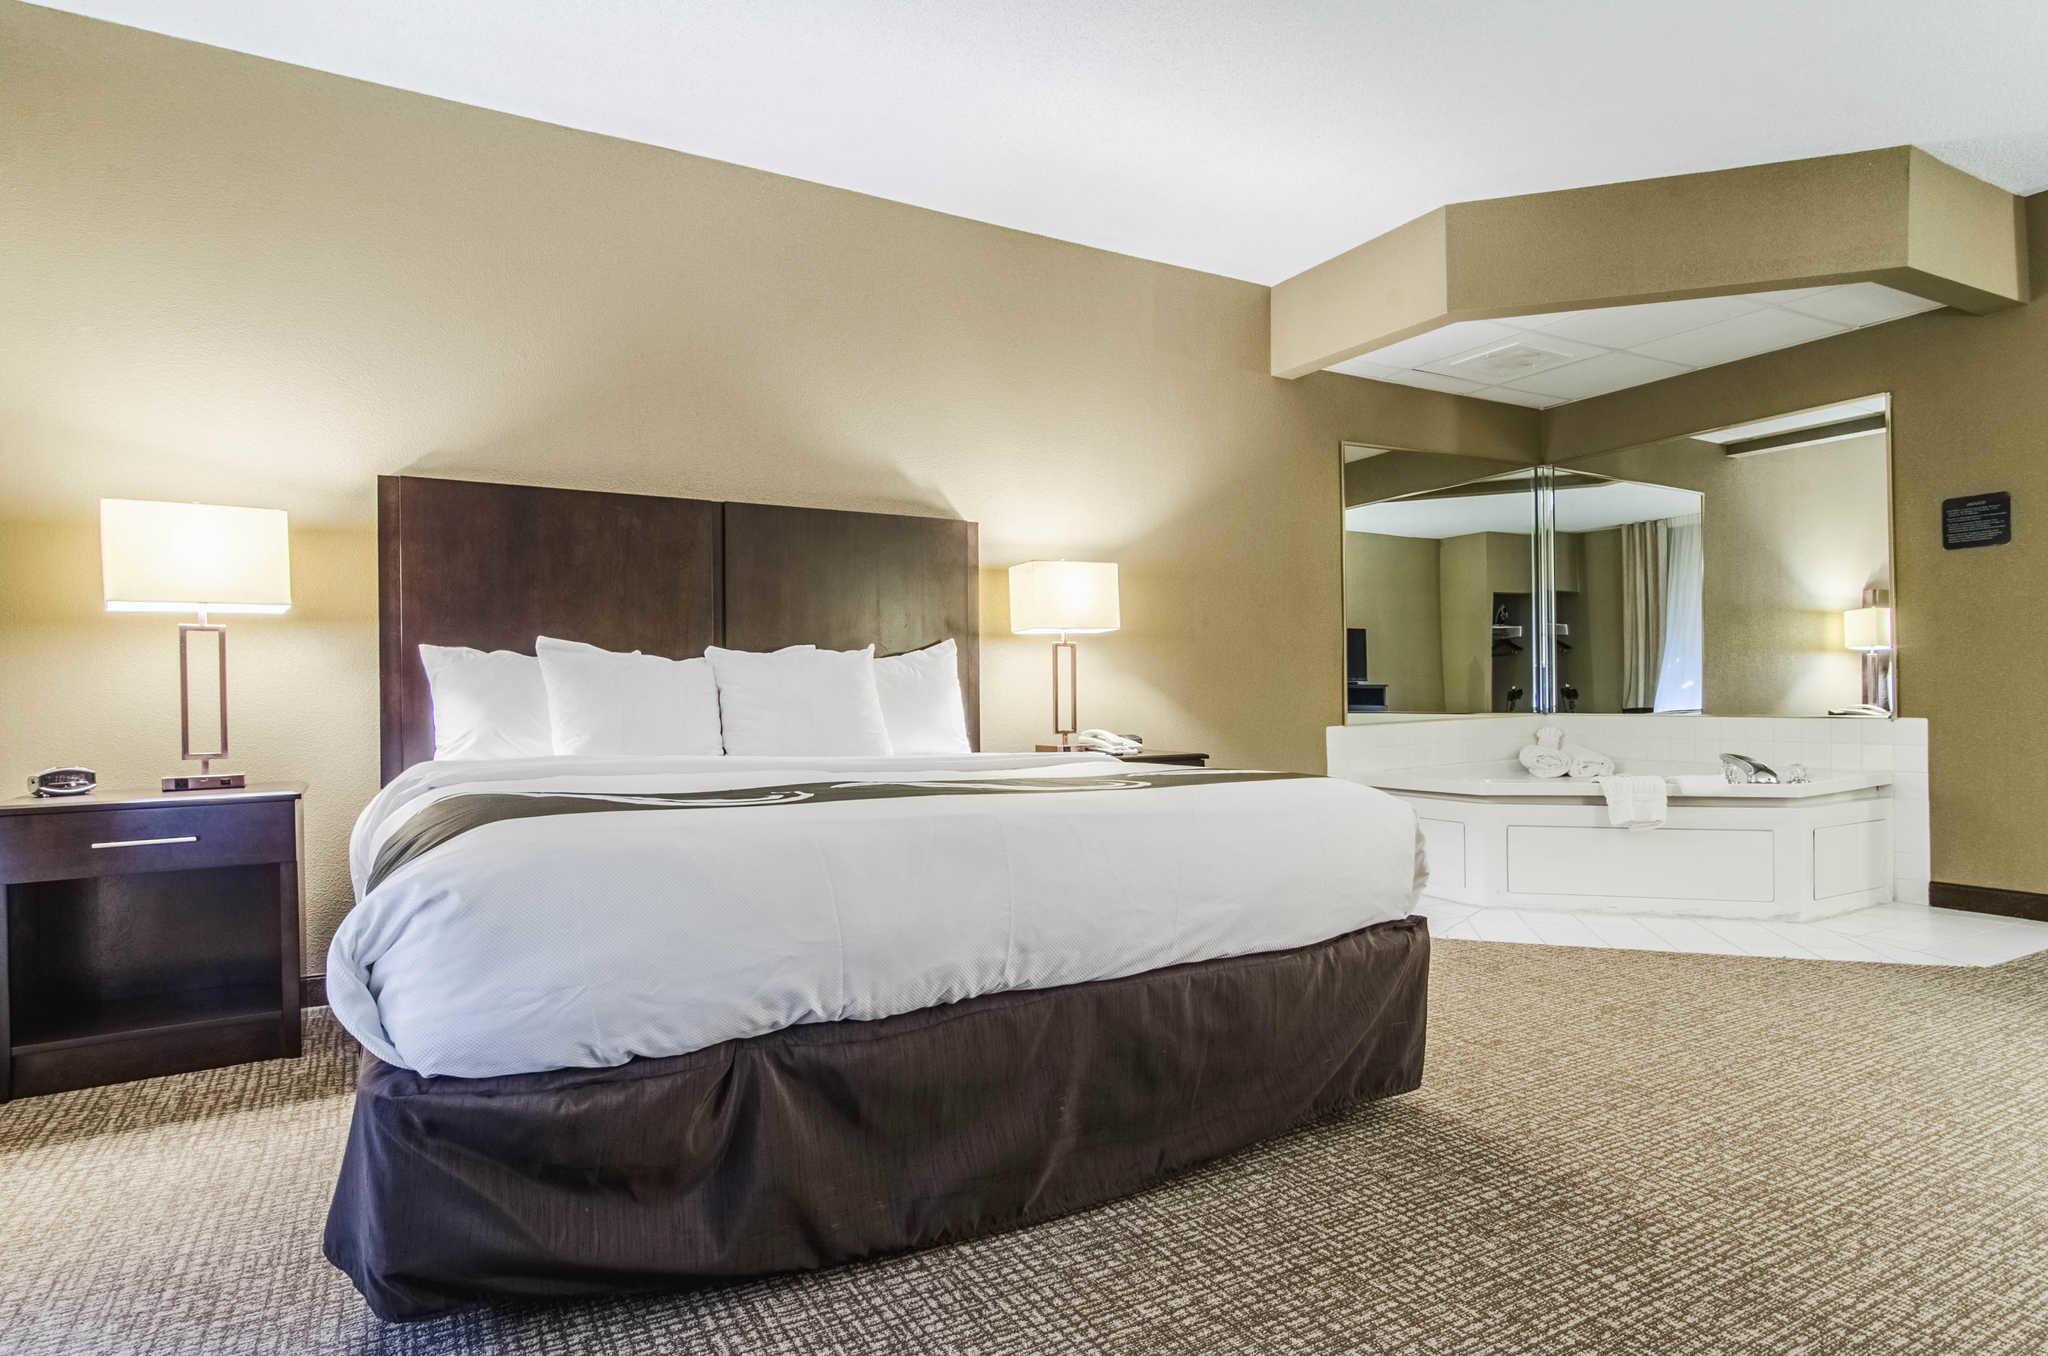 Quality Suites image 10